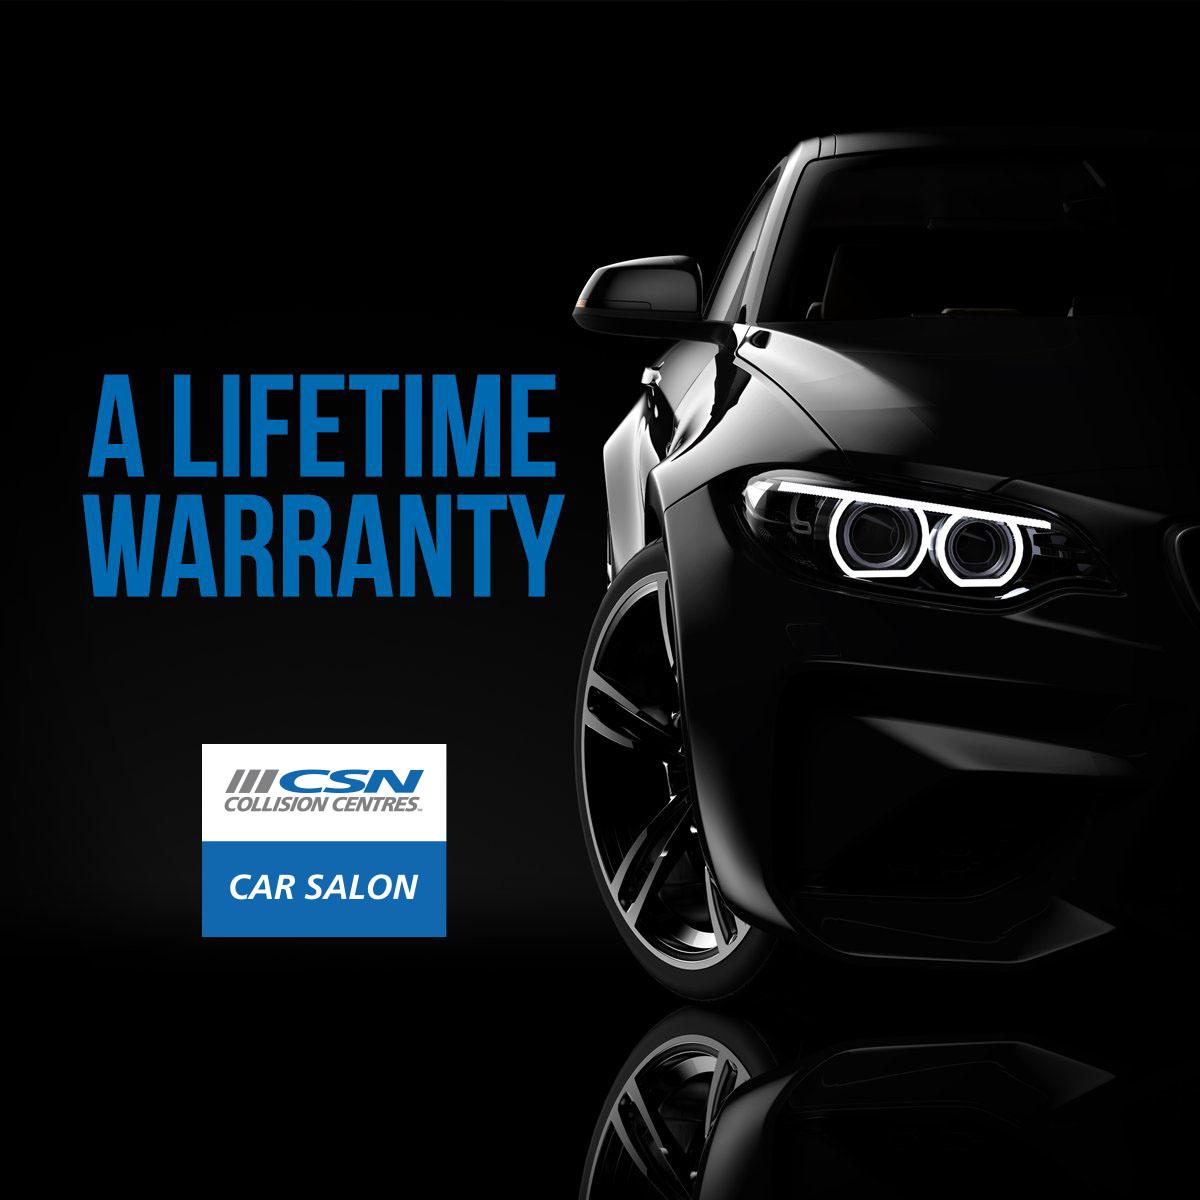 CSN Car Salon Lifetime Warranty